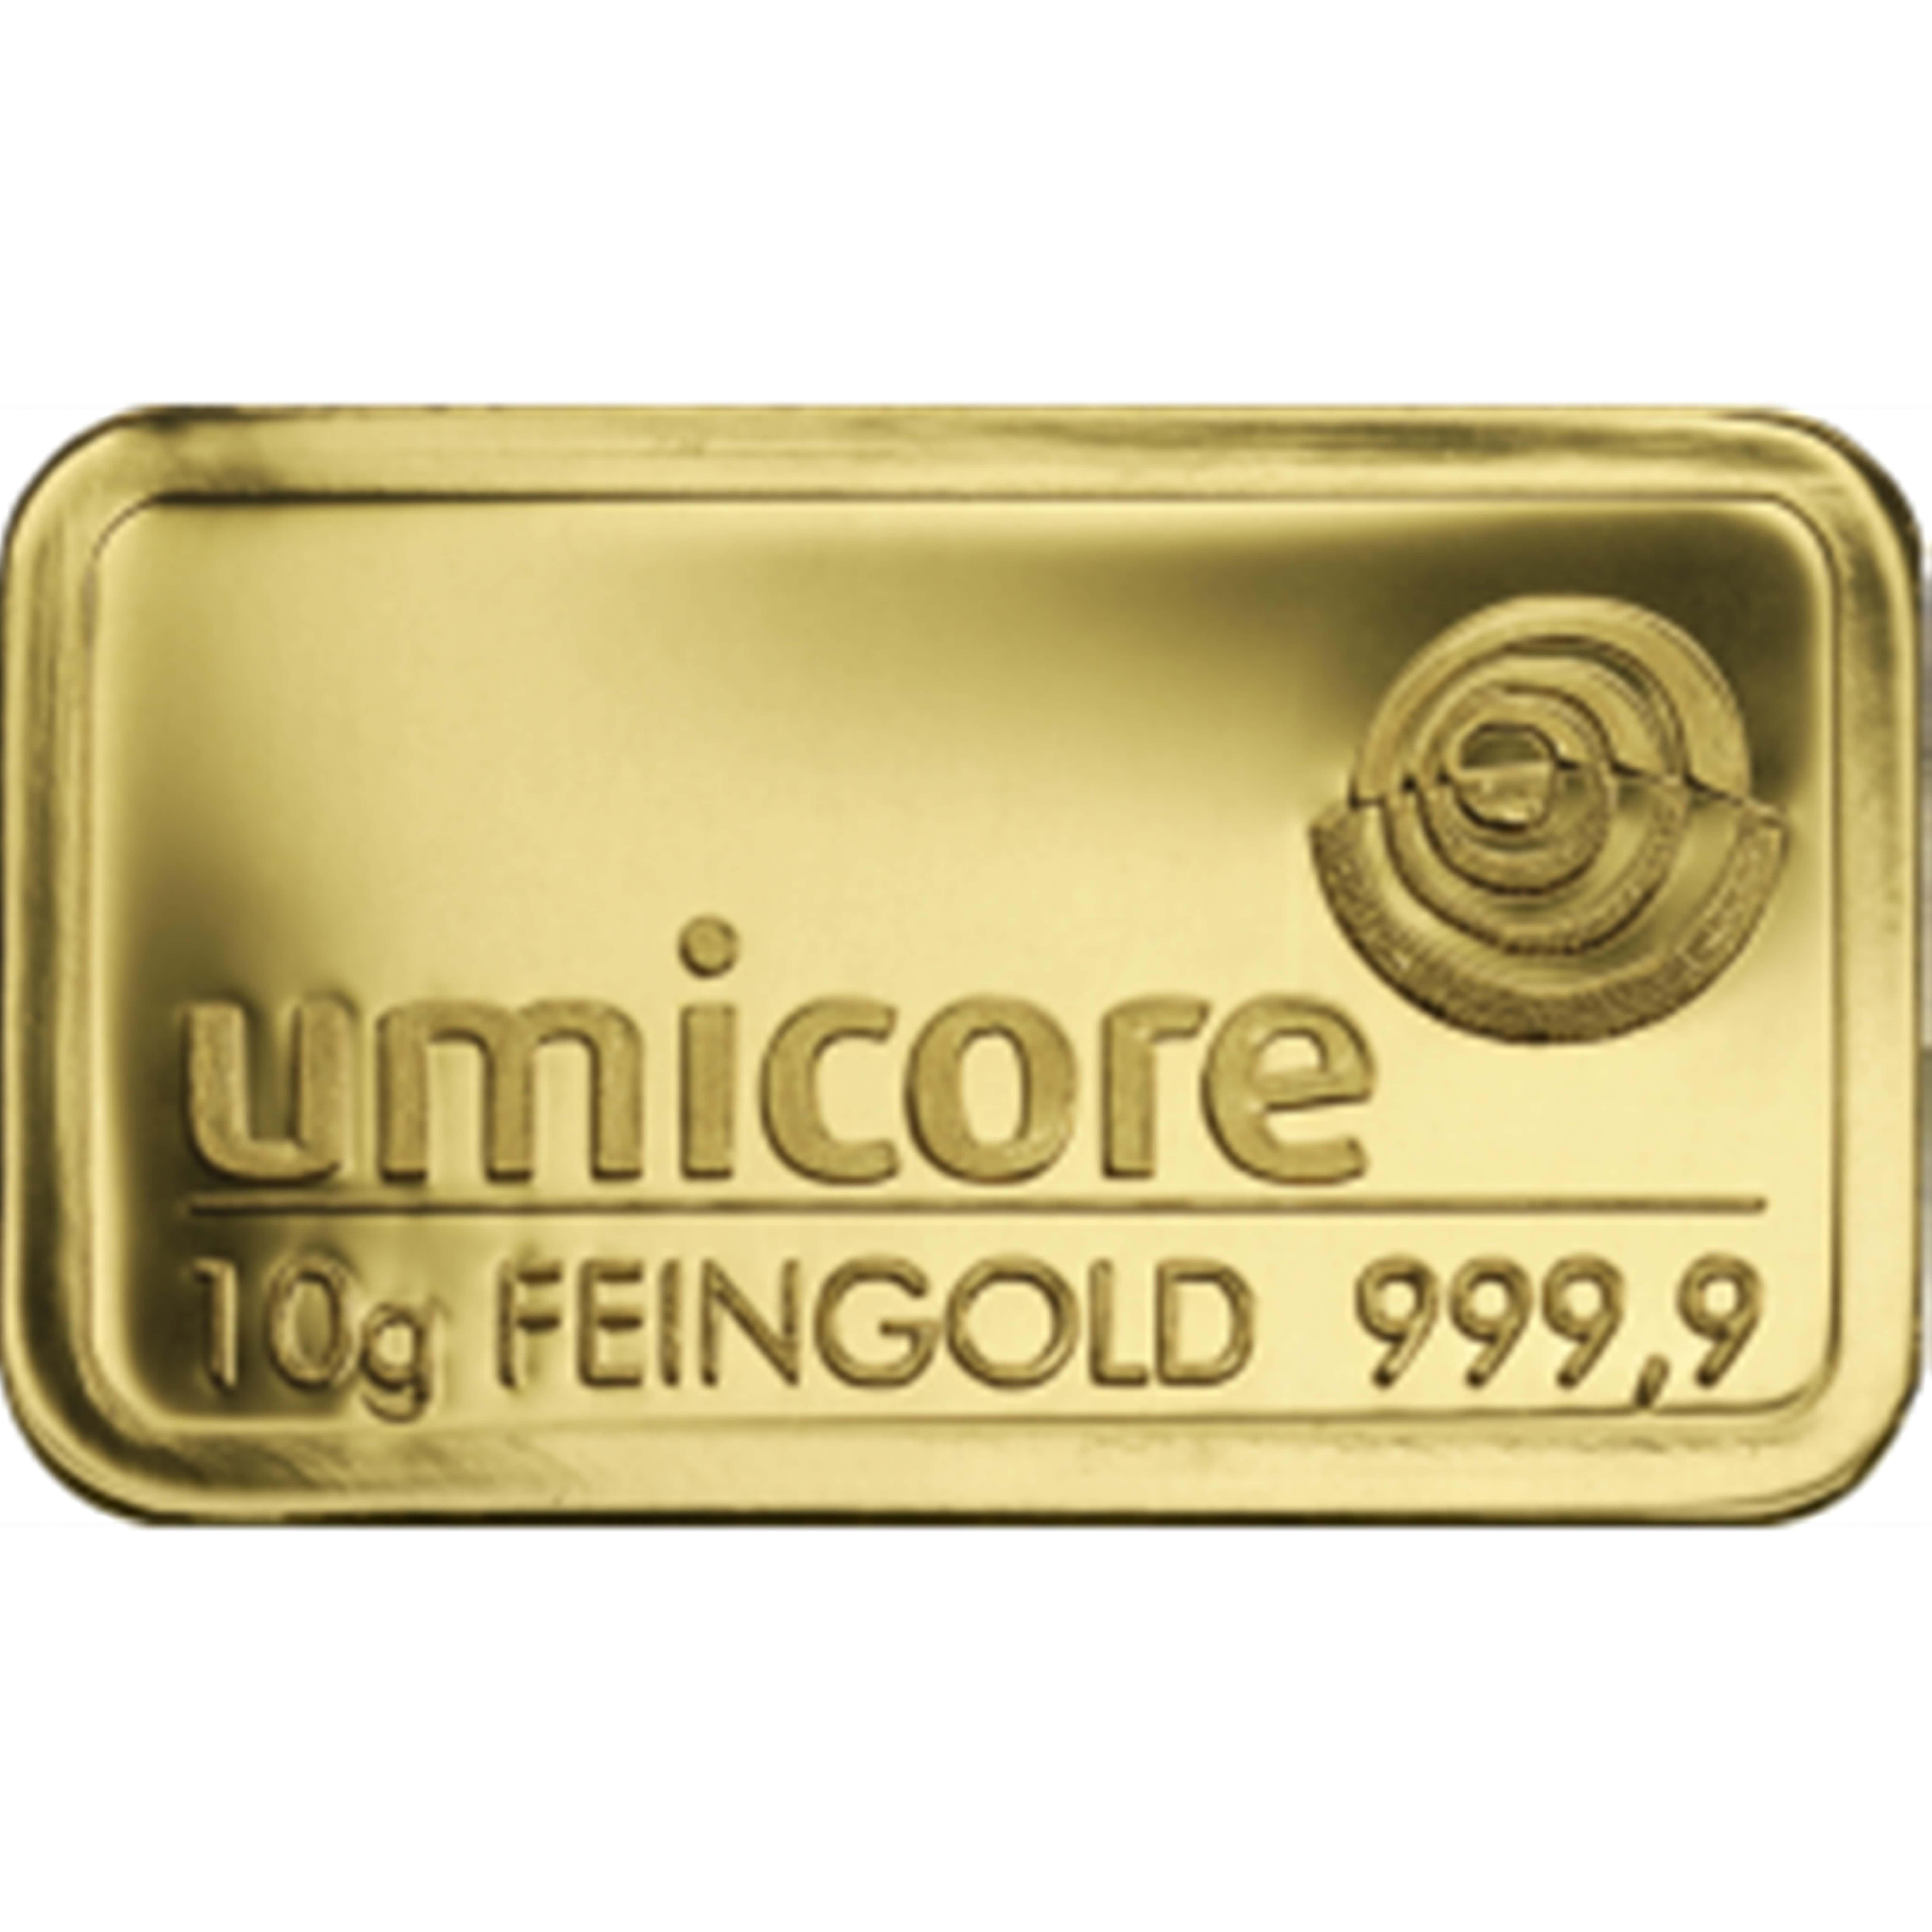 unicore 1 - 10 gram Umicore Fine Gold Bar 24 Carat 999.9 Bullion  #